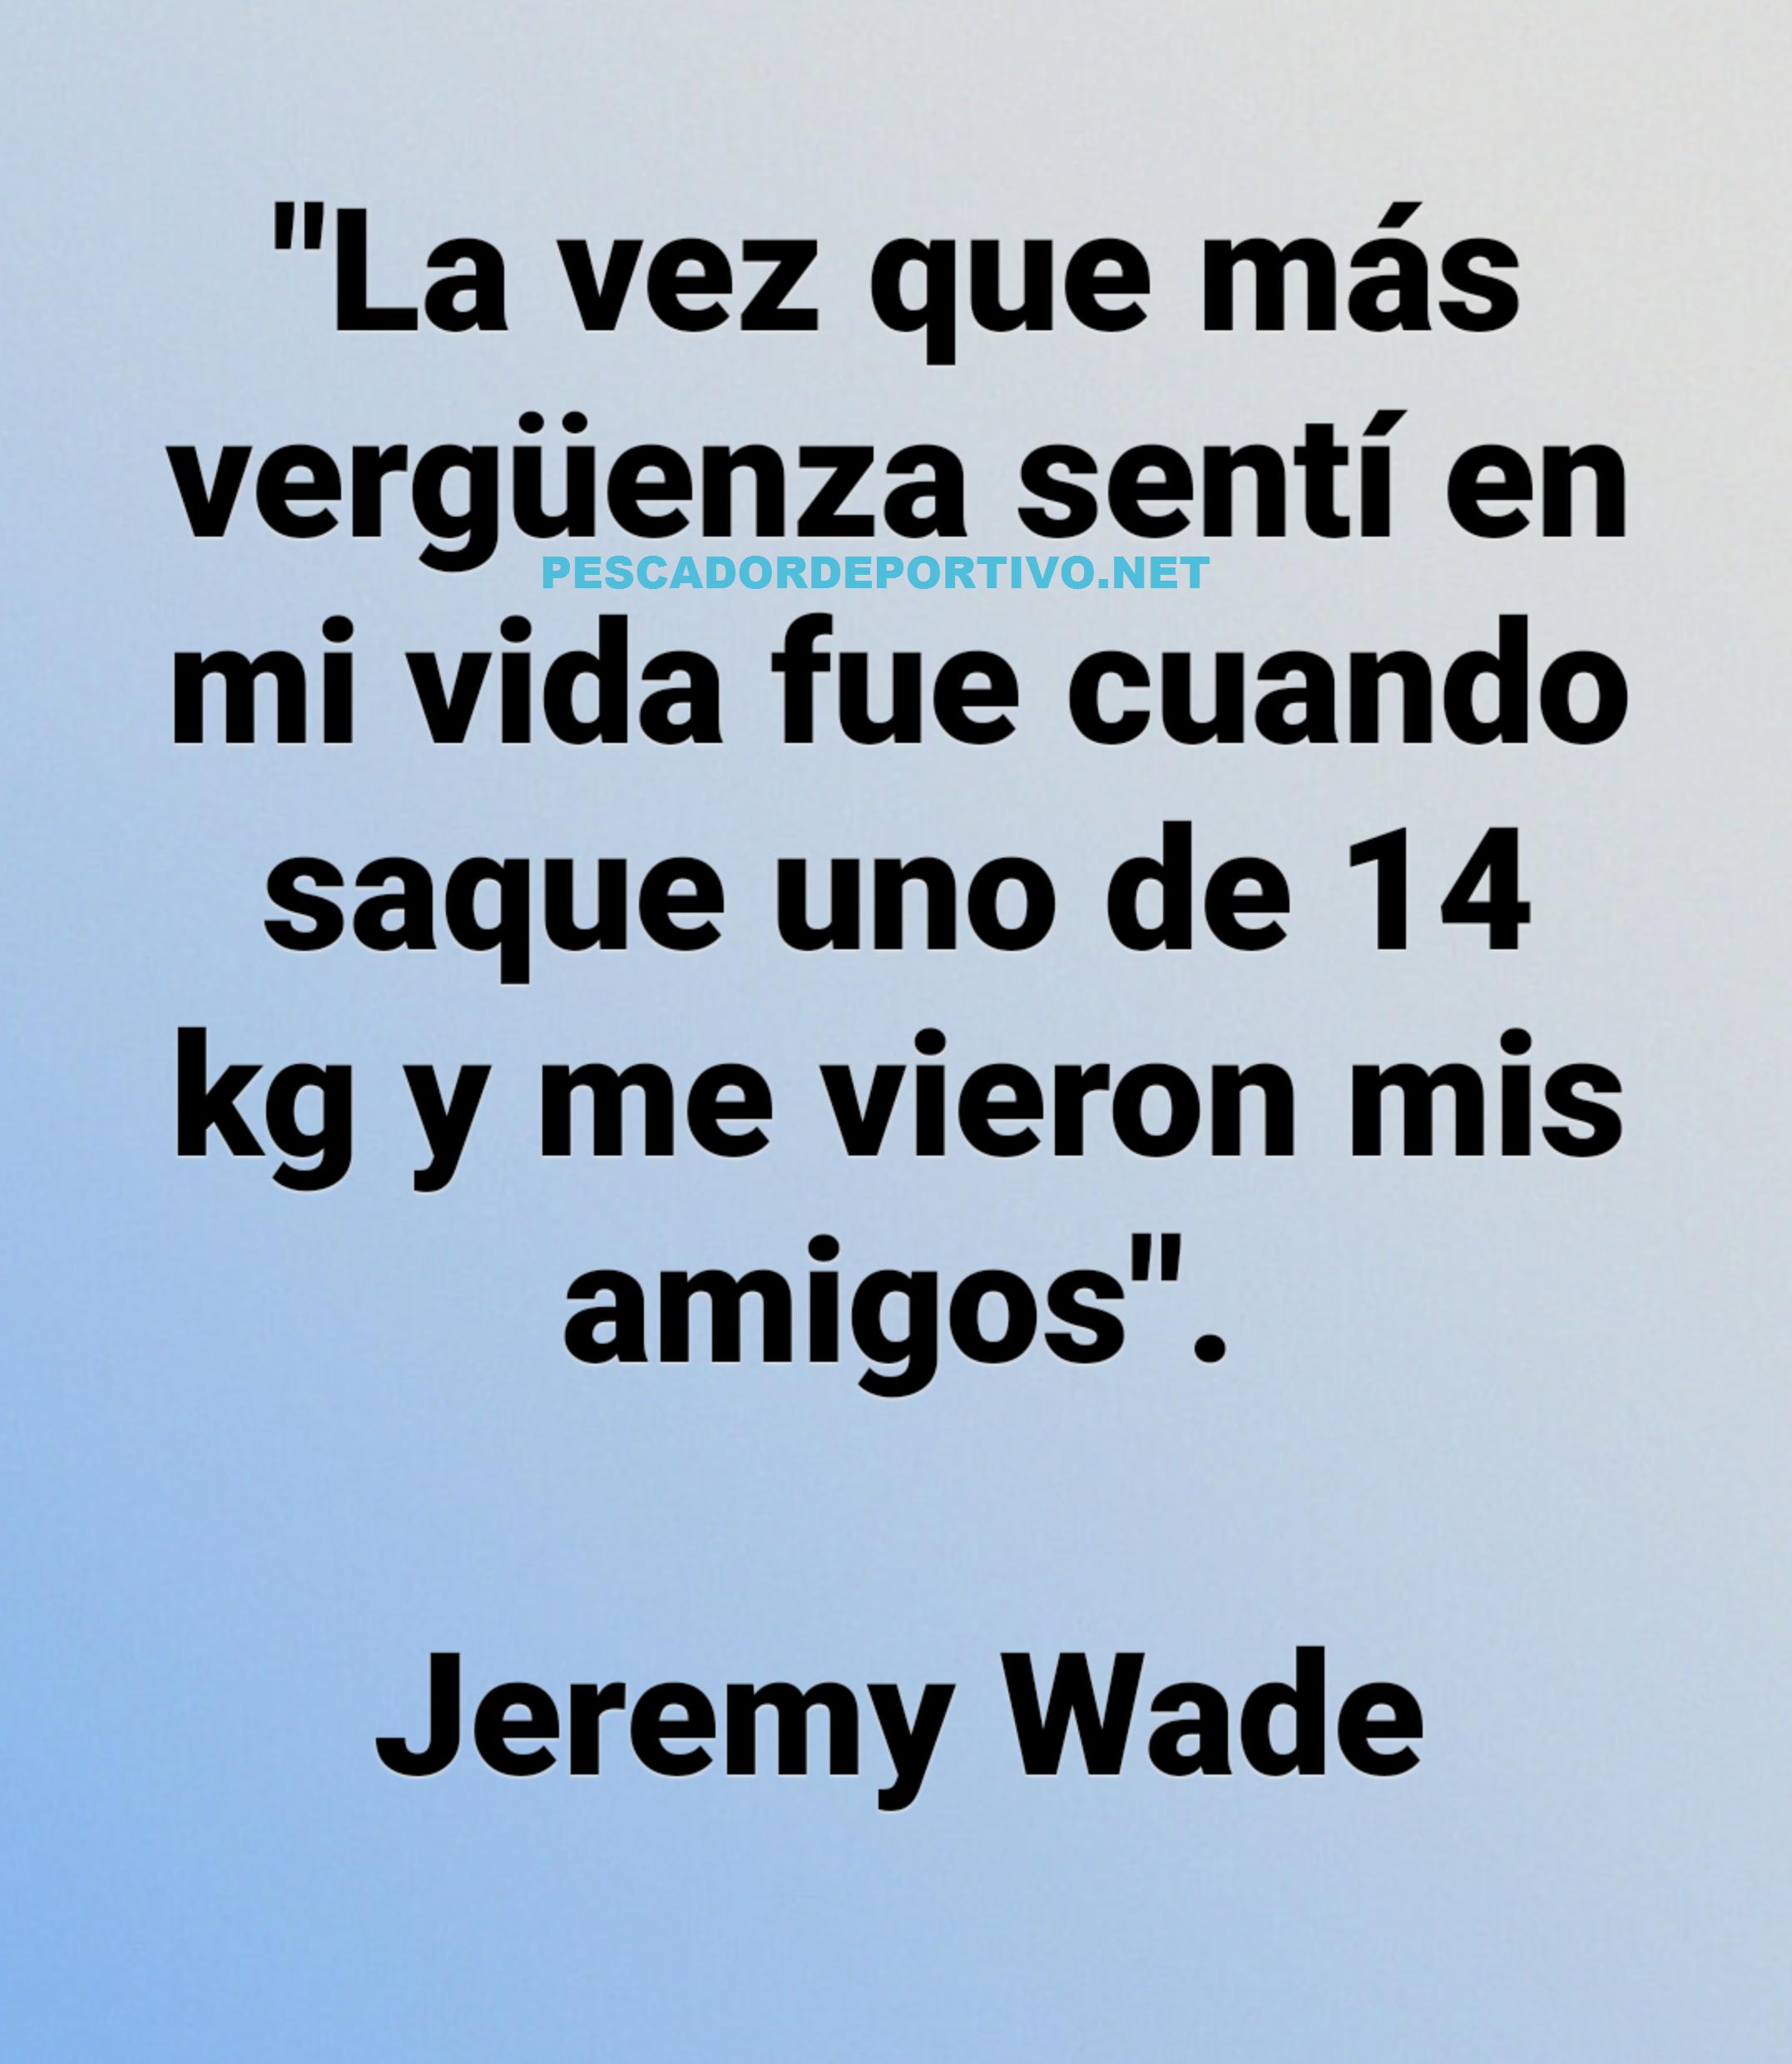 Meme Jeremy Wade 12